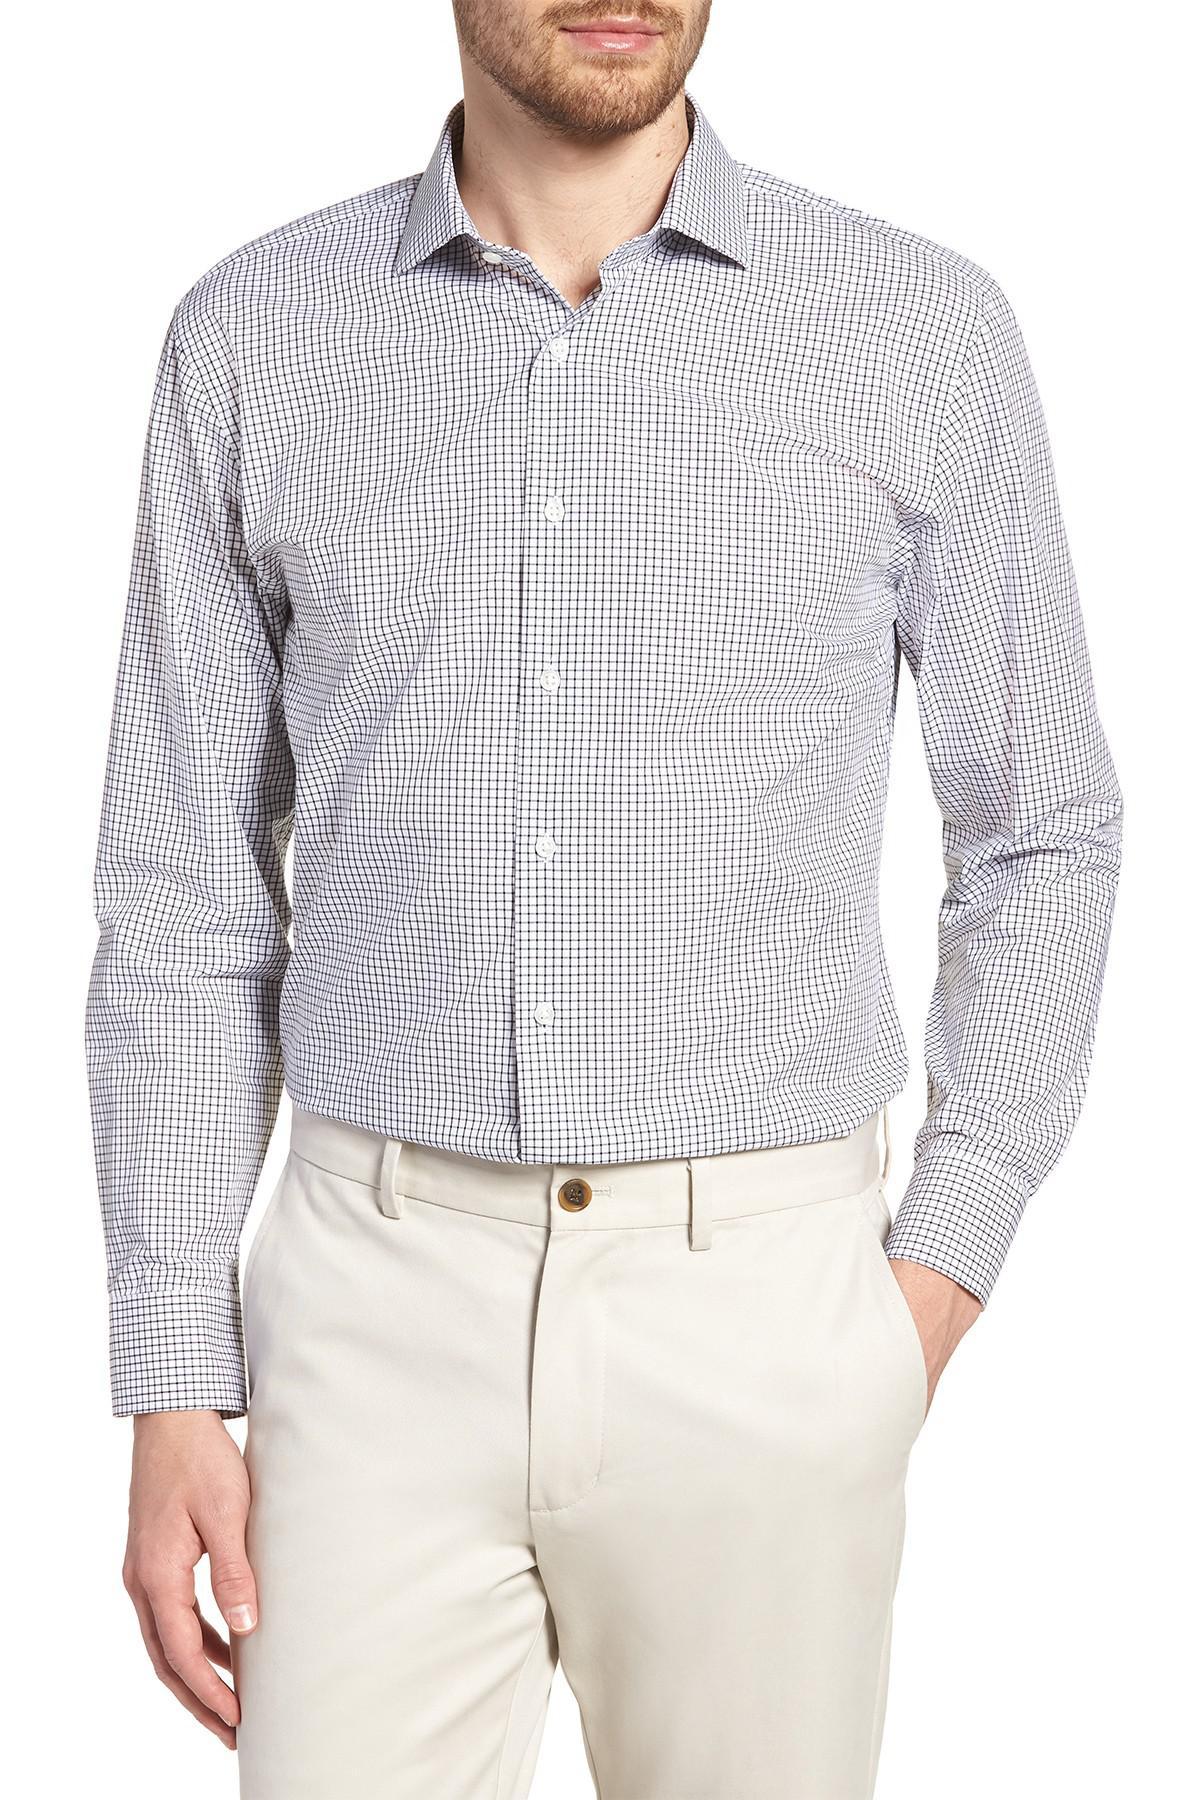 a0b0a3af6a Nordstrom Rack Mens Linen Shirts